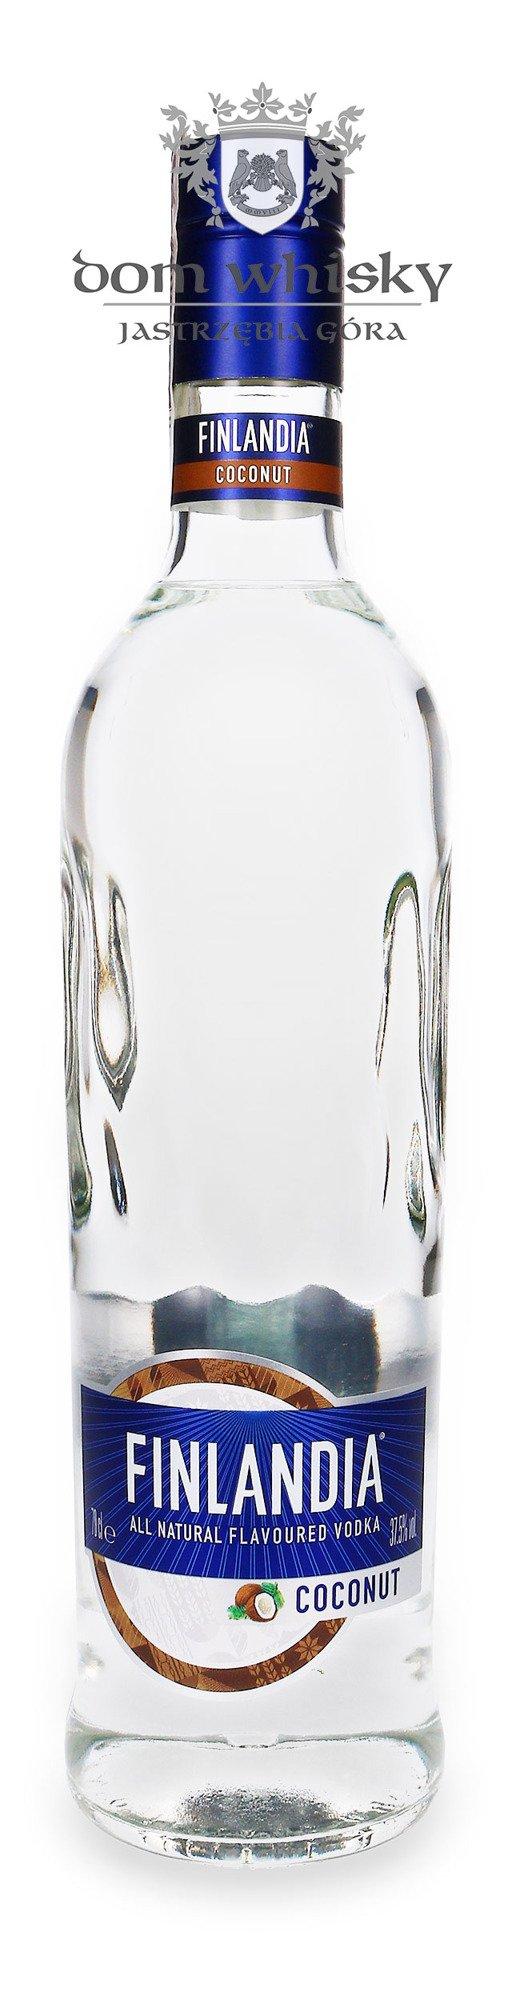 4bd454c9882f1a Wódka Finlandia Coconut / 37,5% / 0,7l. Cena katalogowa: